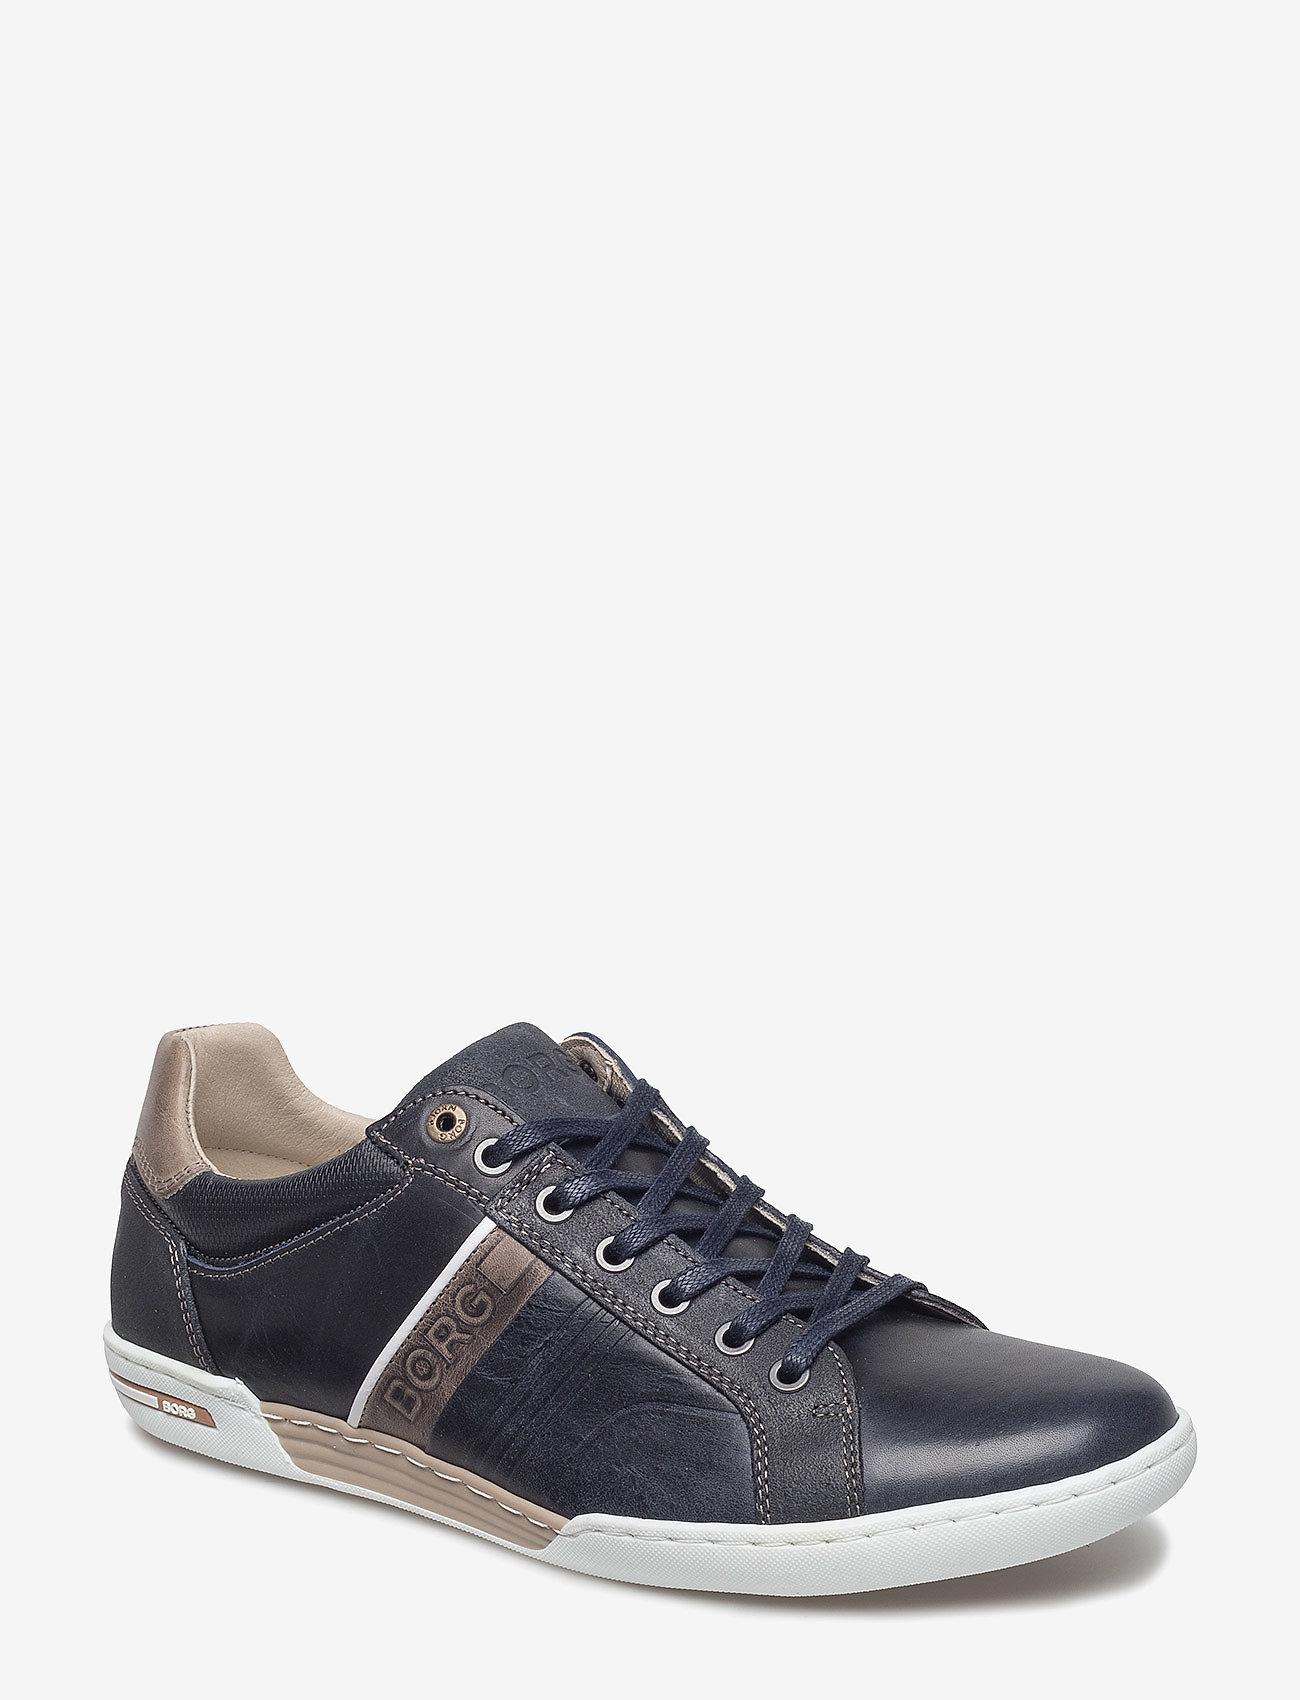 Björn Borg - Coltrane Nu Trm M - laag sneakers - navy/grey - 0